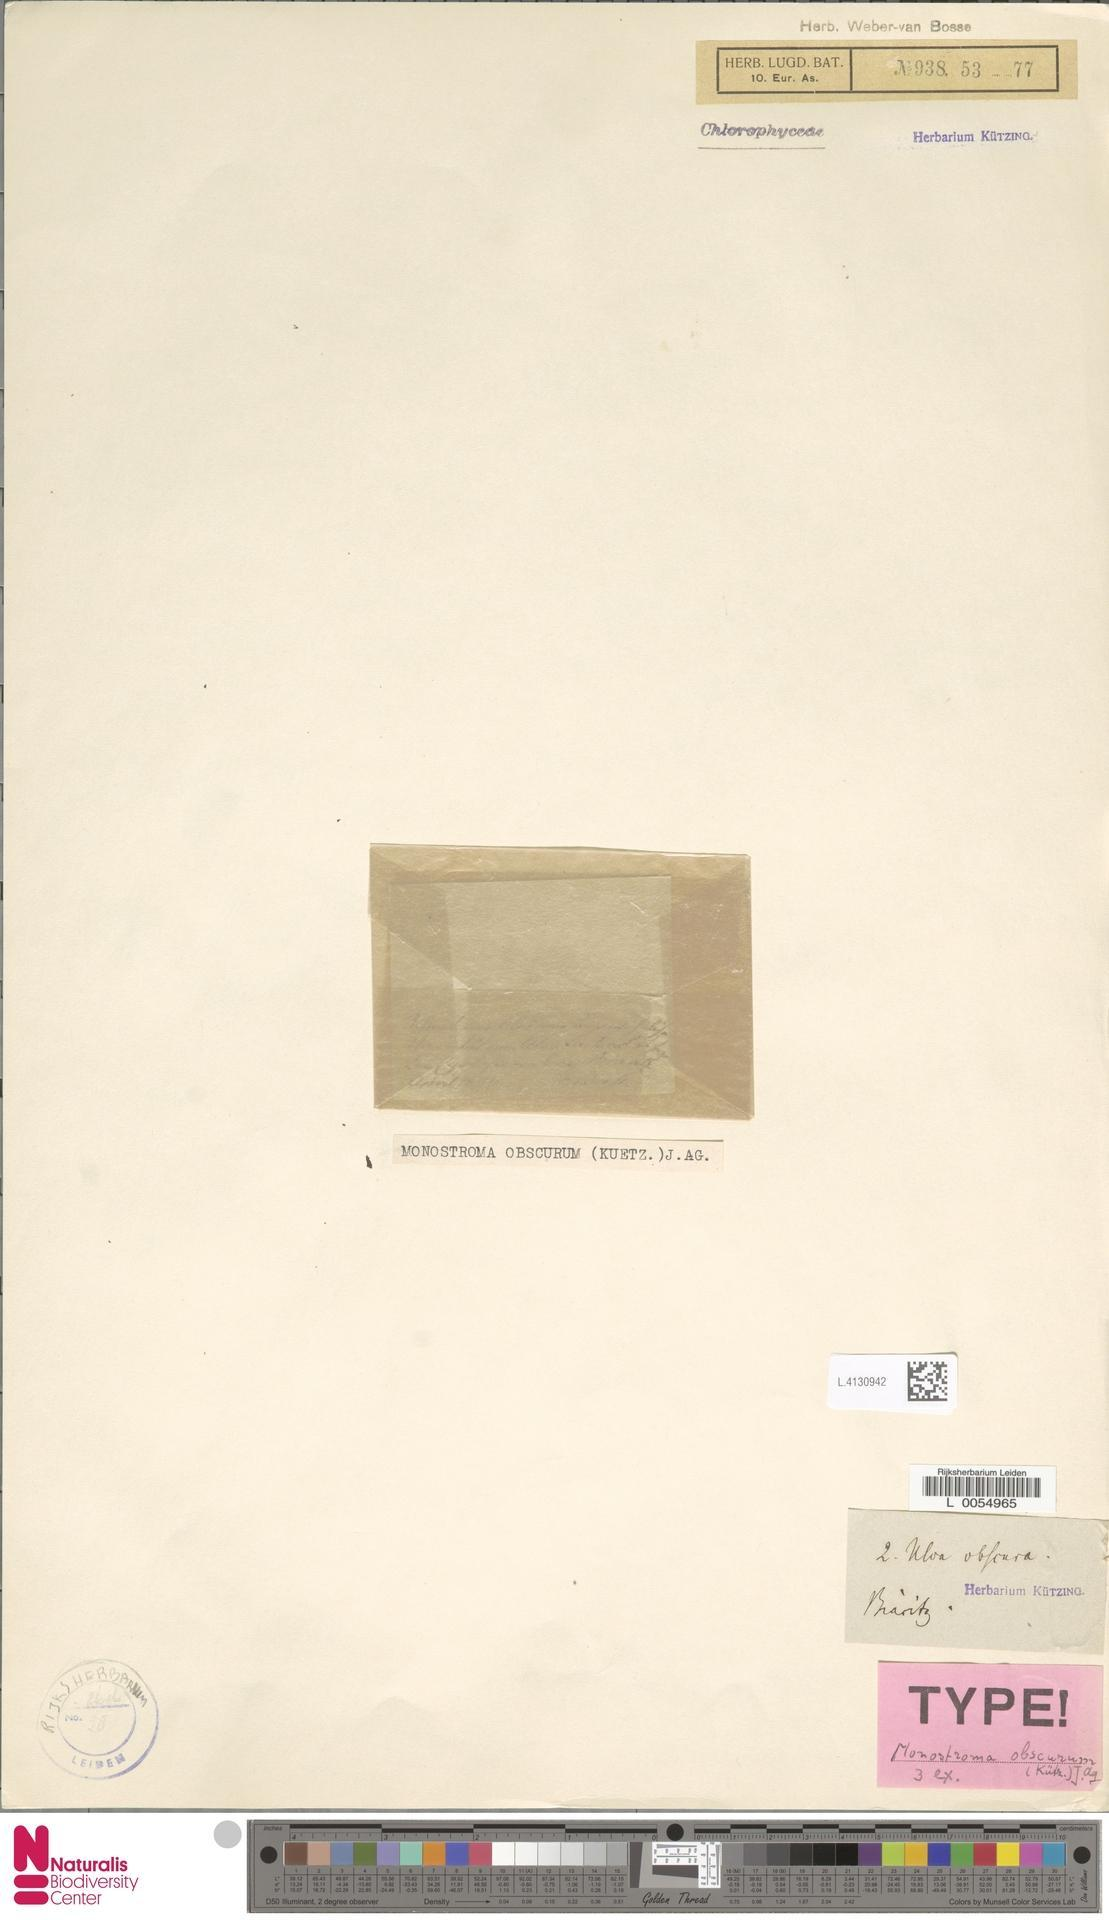 Image of Monostroma